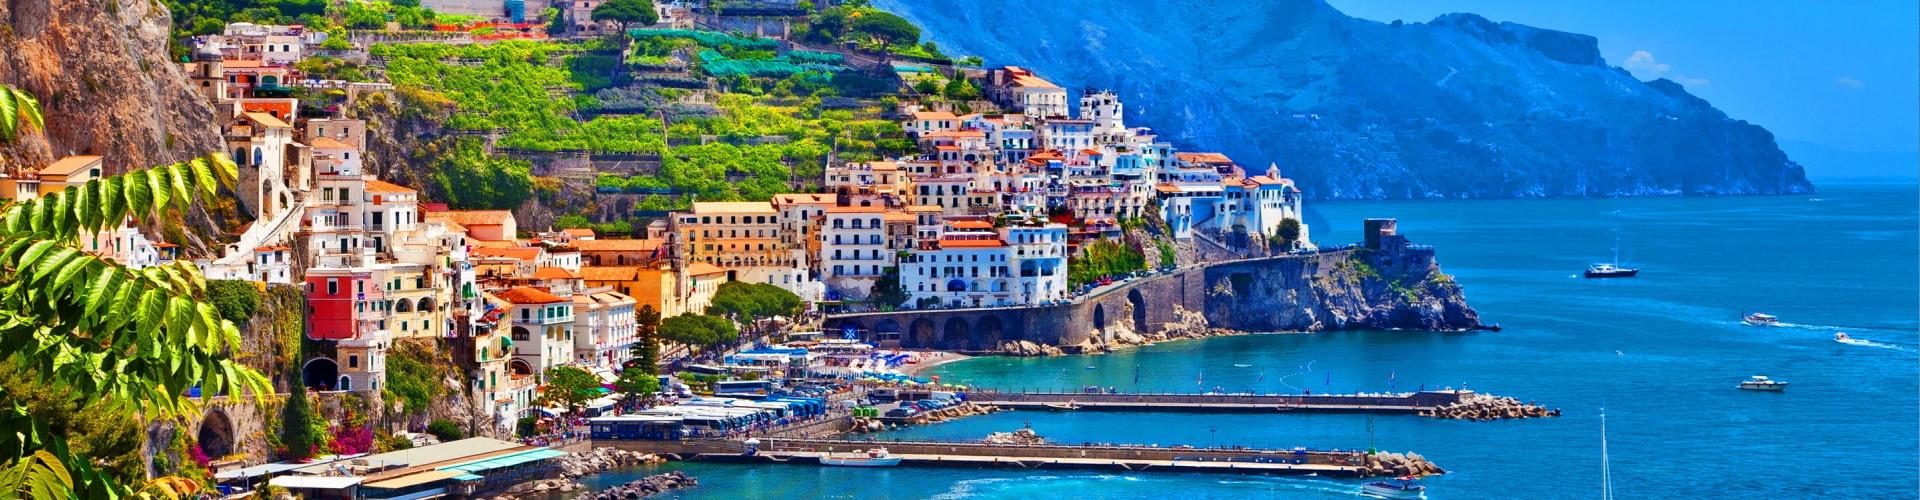 almalfi-coast-bethel-tour-vacations